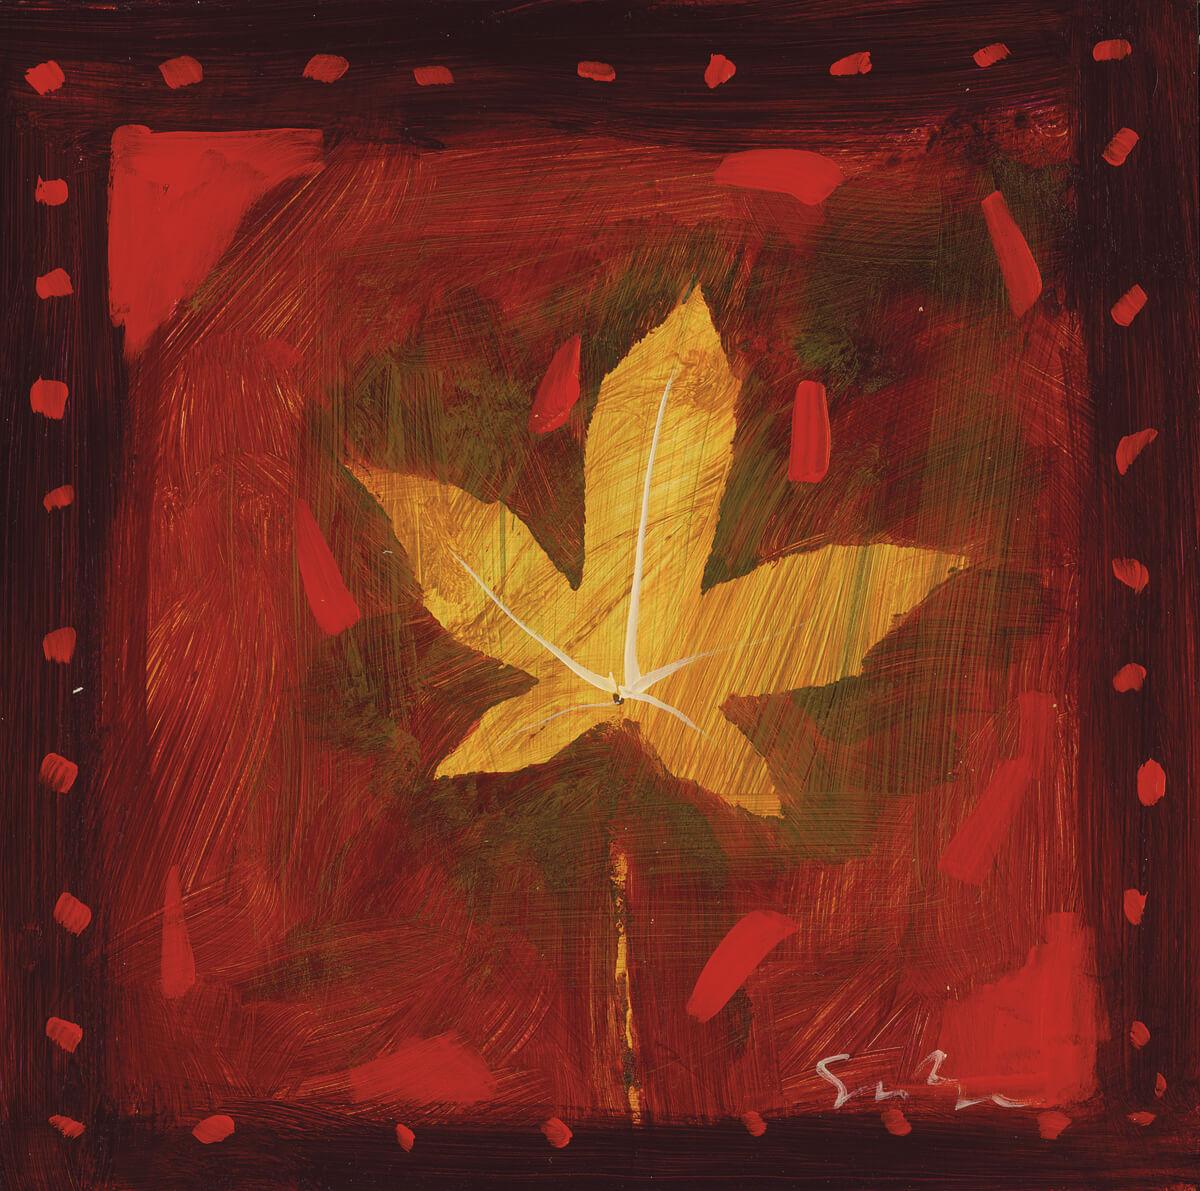 """Falling Leaves Series I - III"" (2007) Simon Bull"